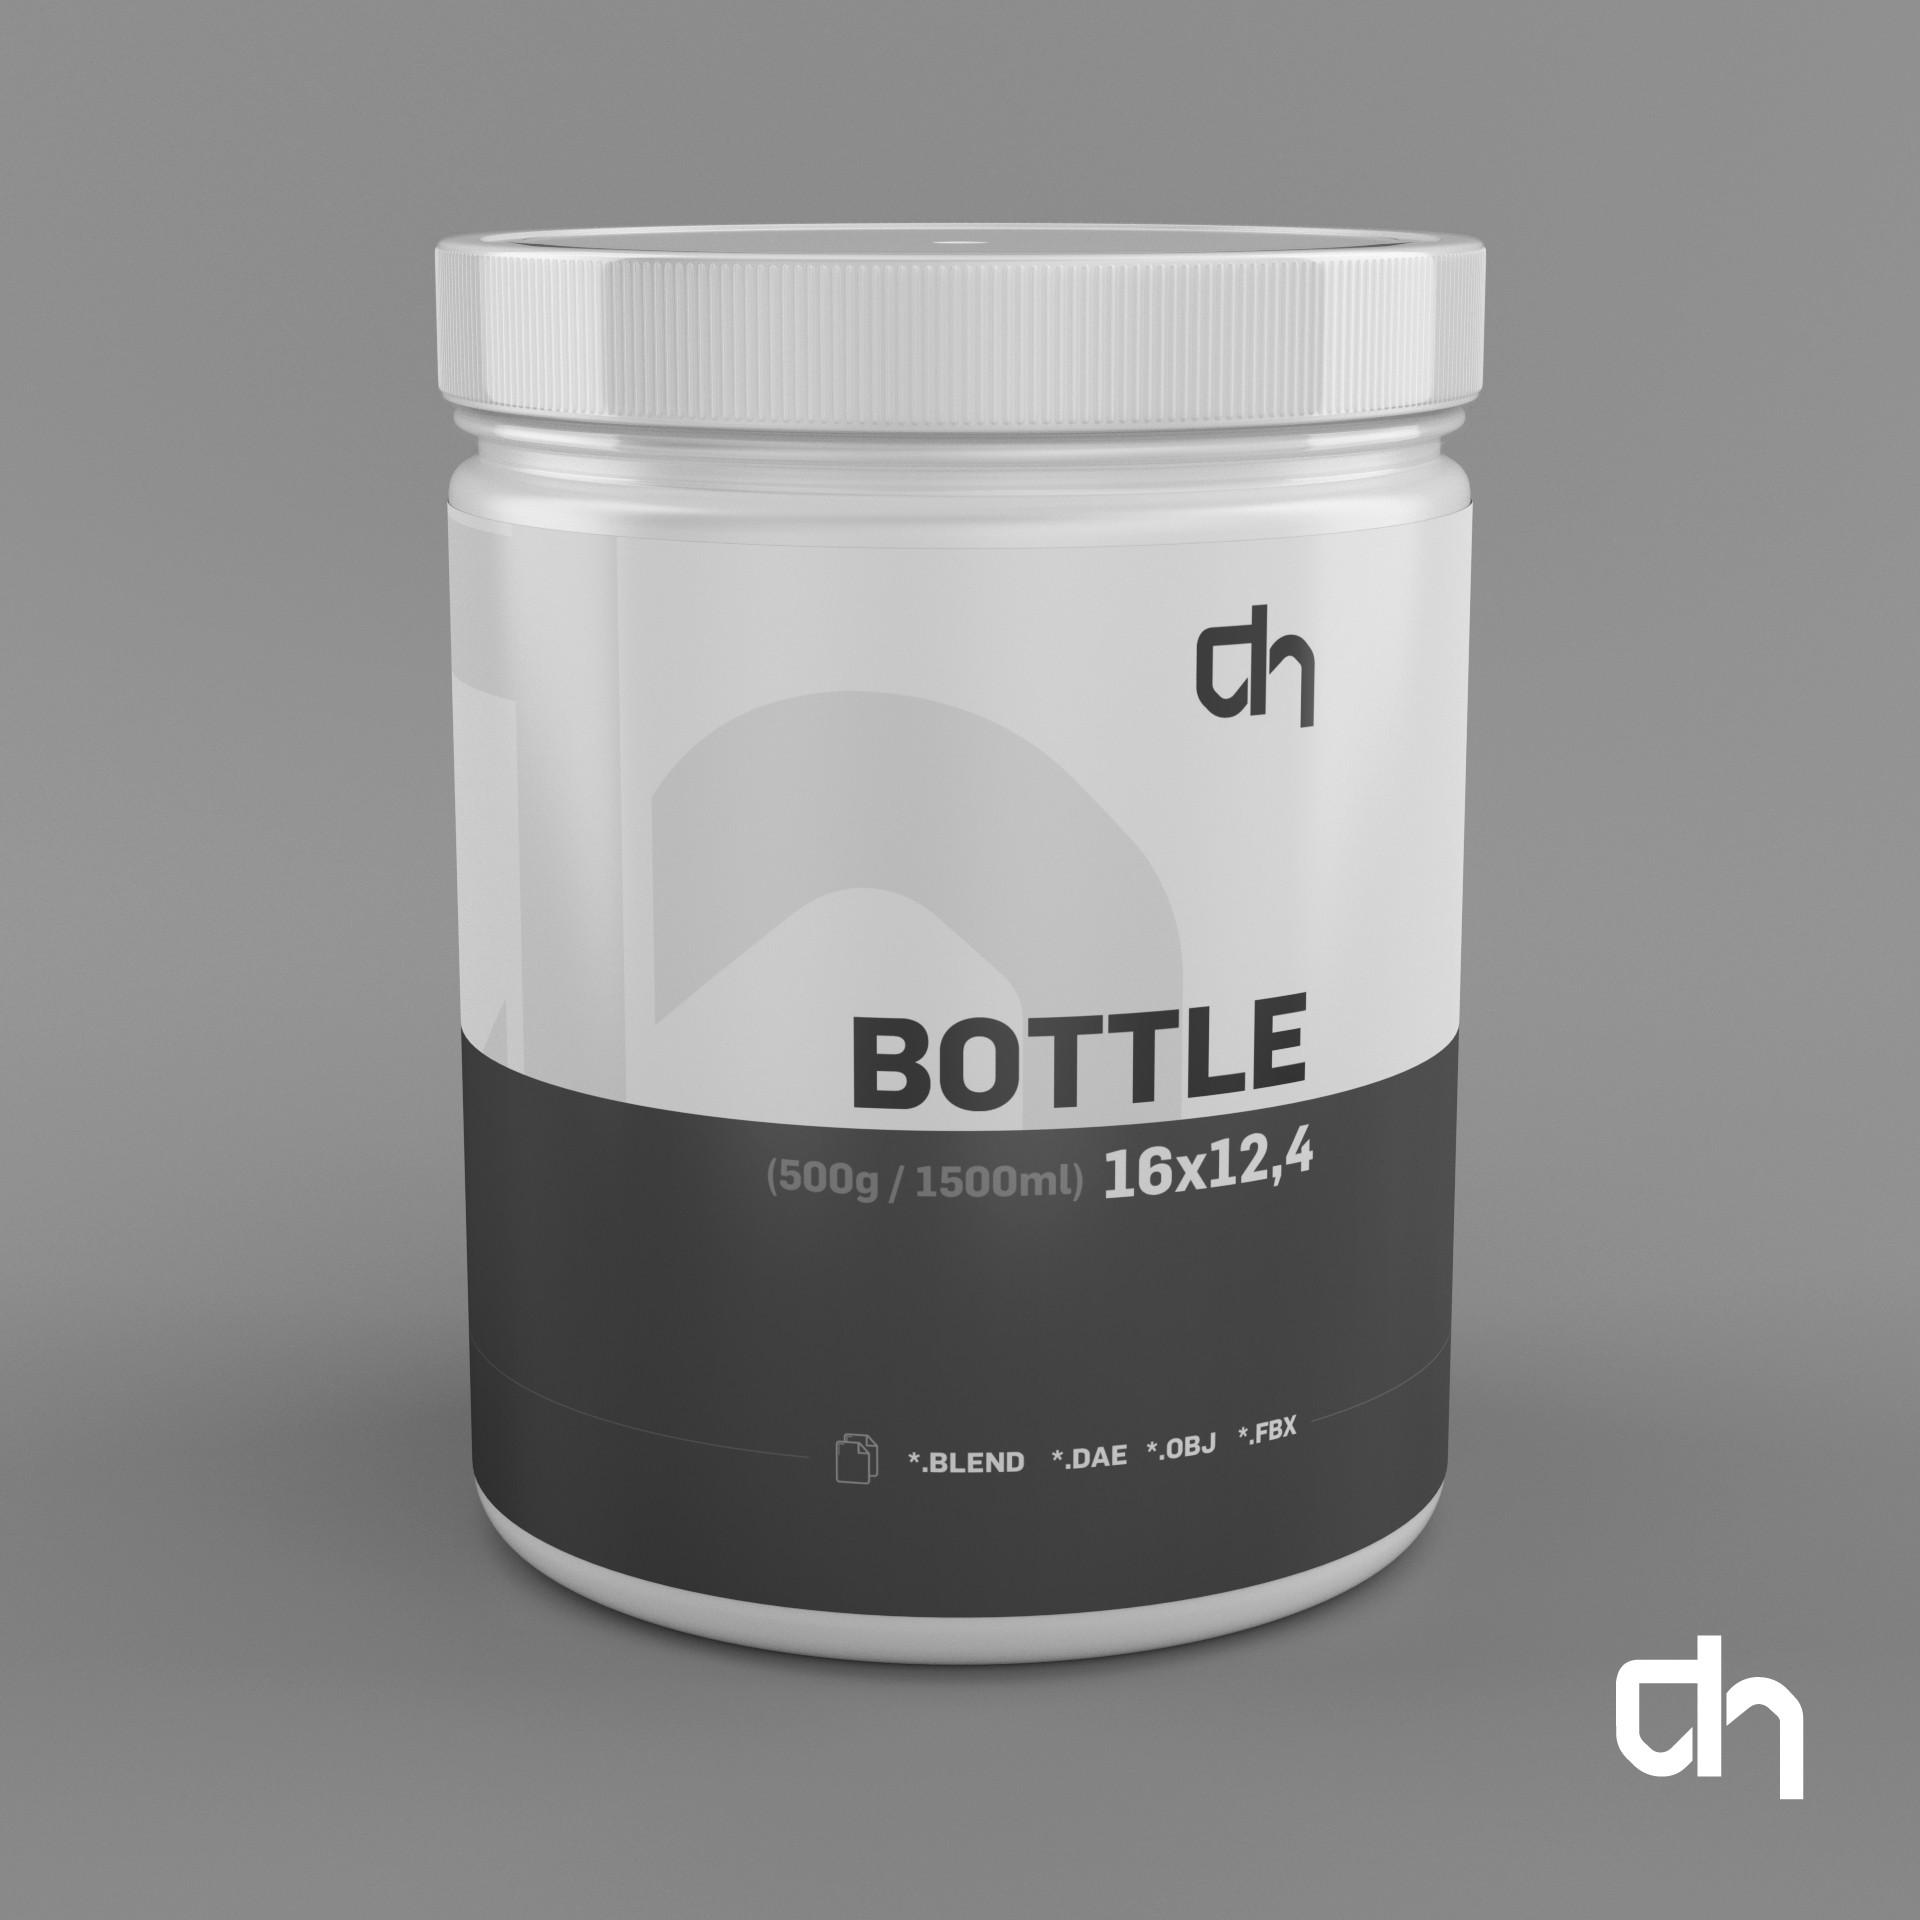 Bottle16x12,4.jpg